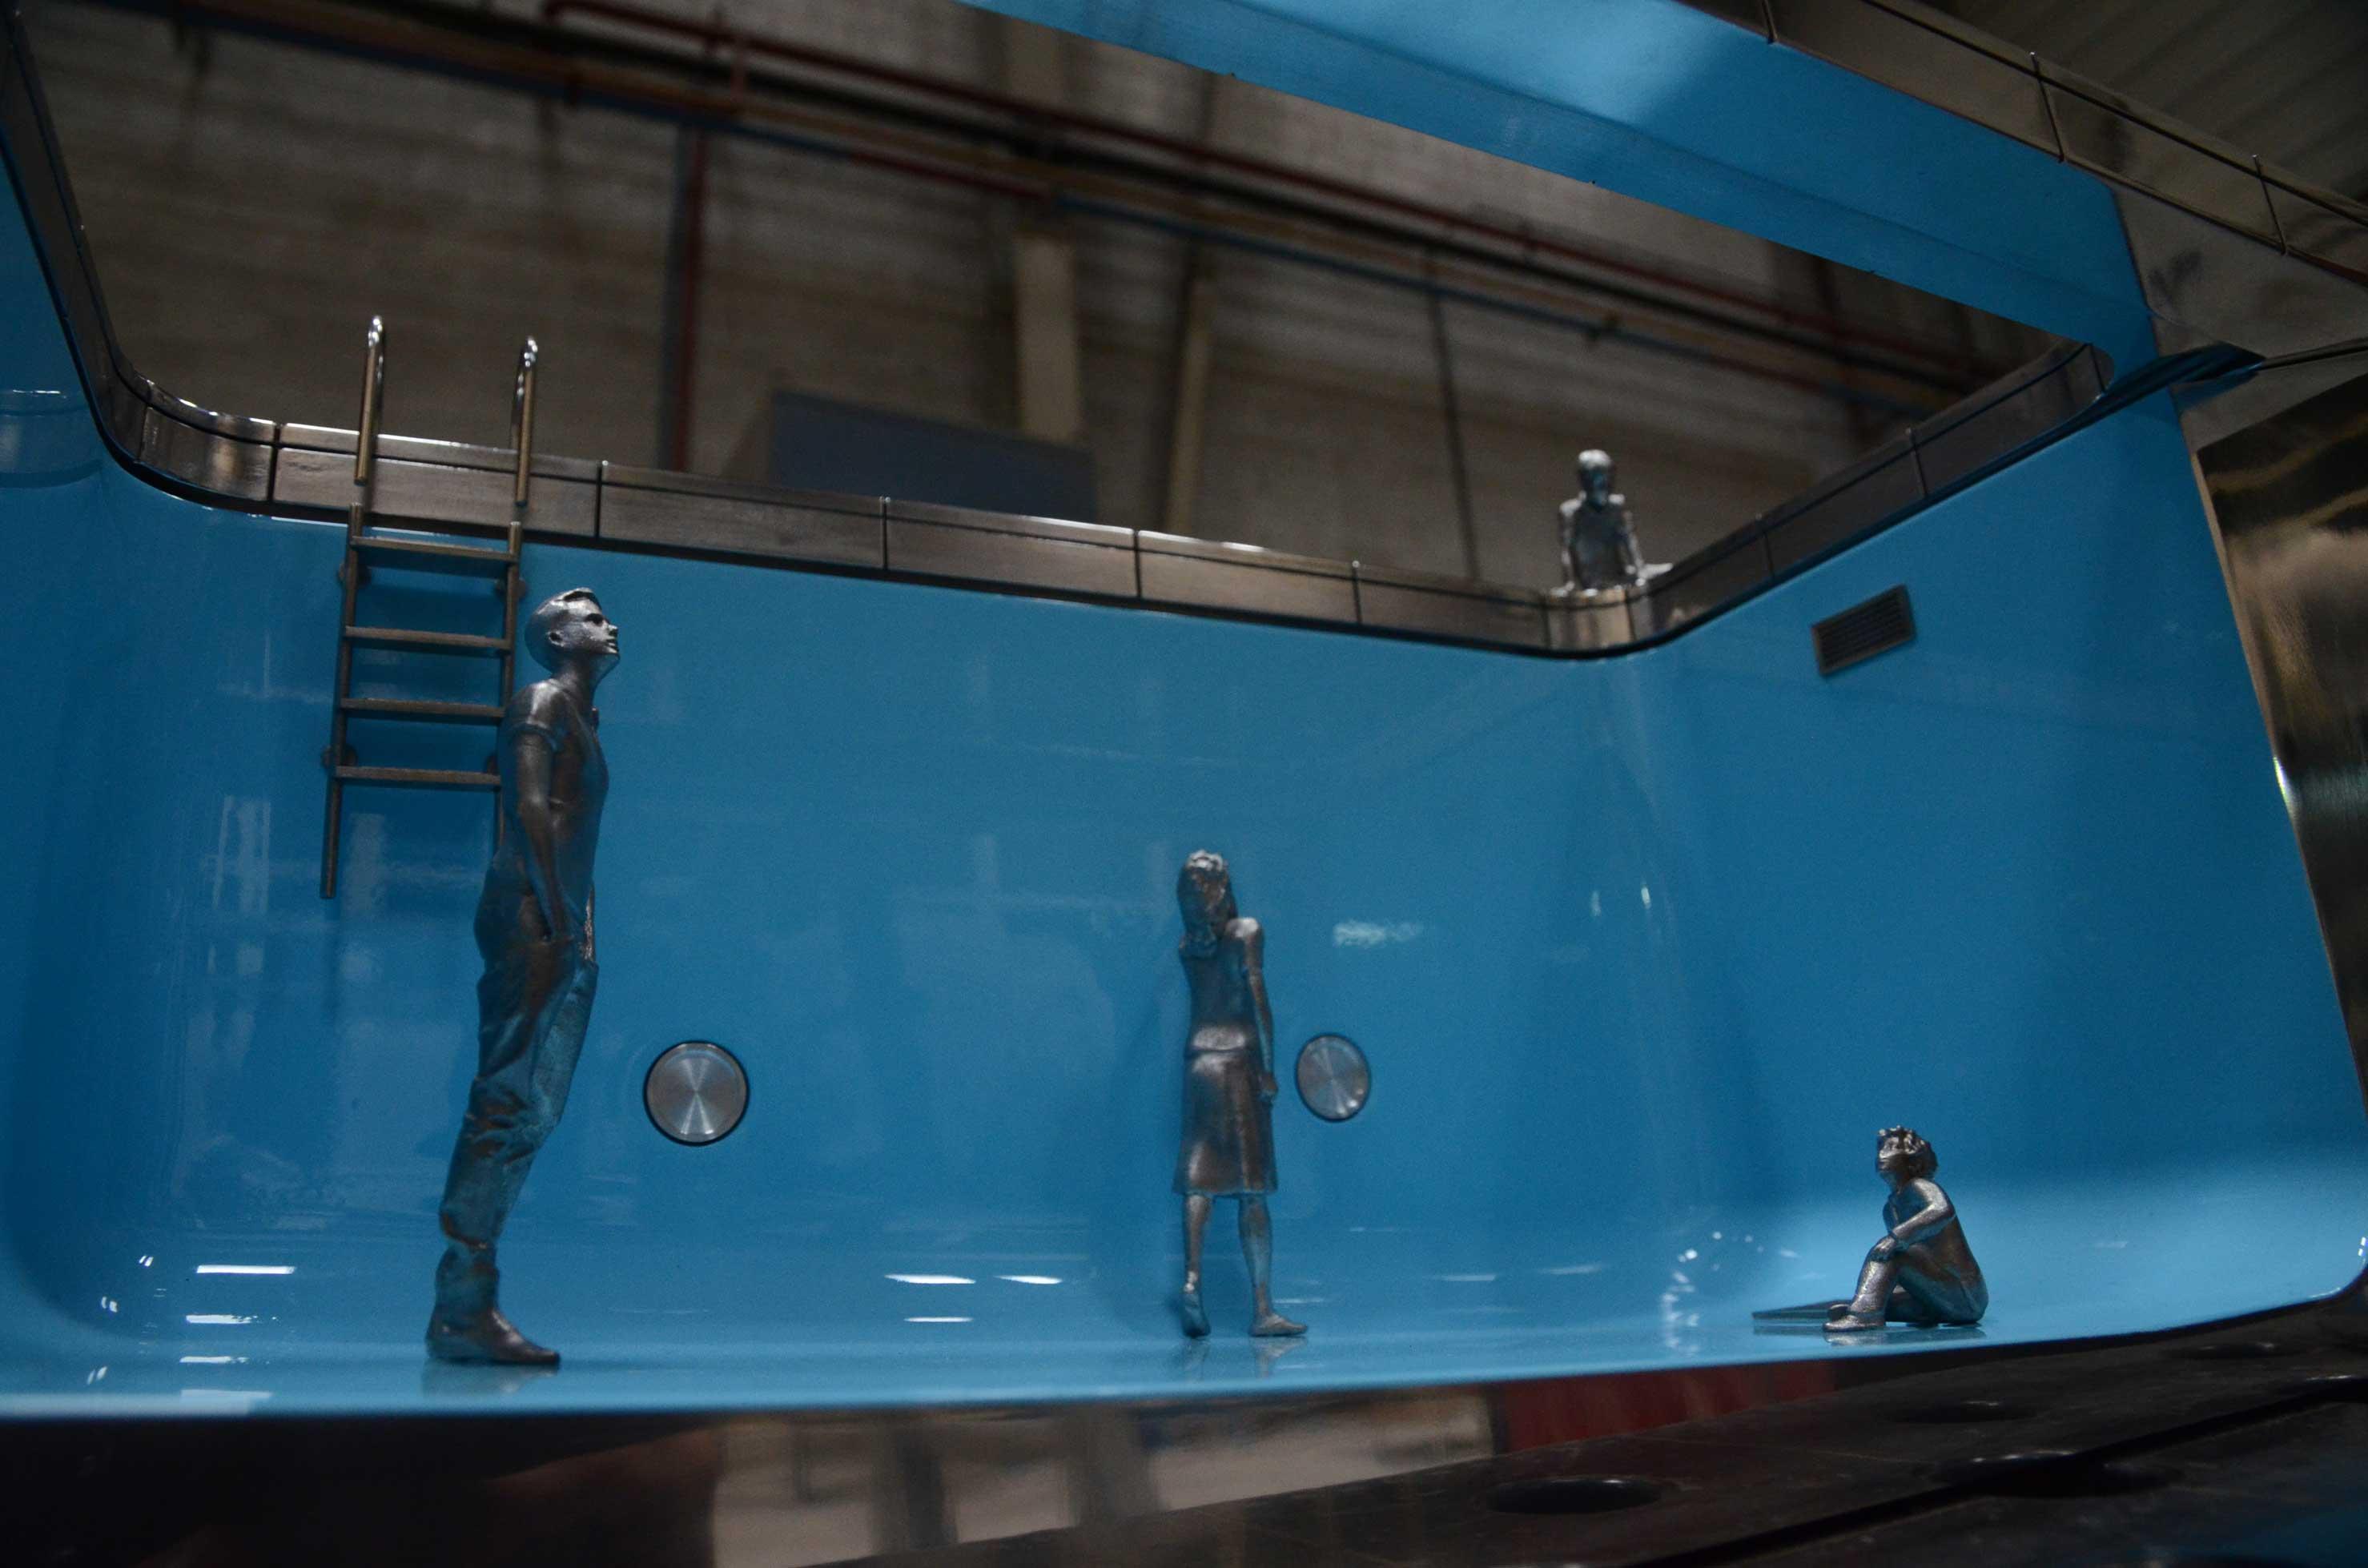 Silver Pool